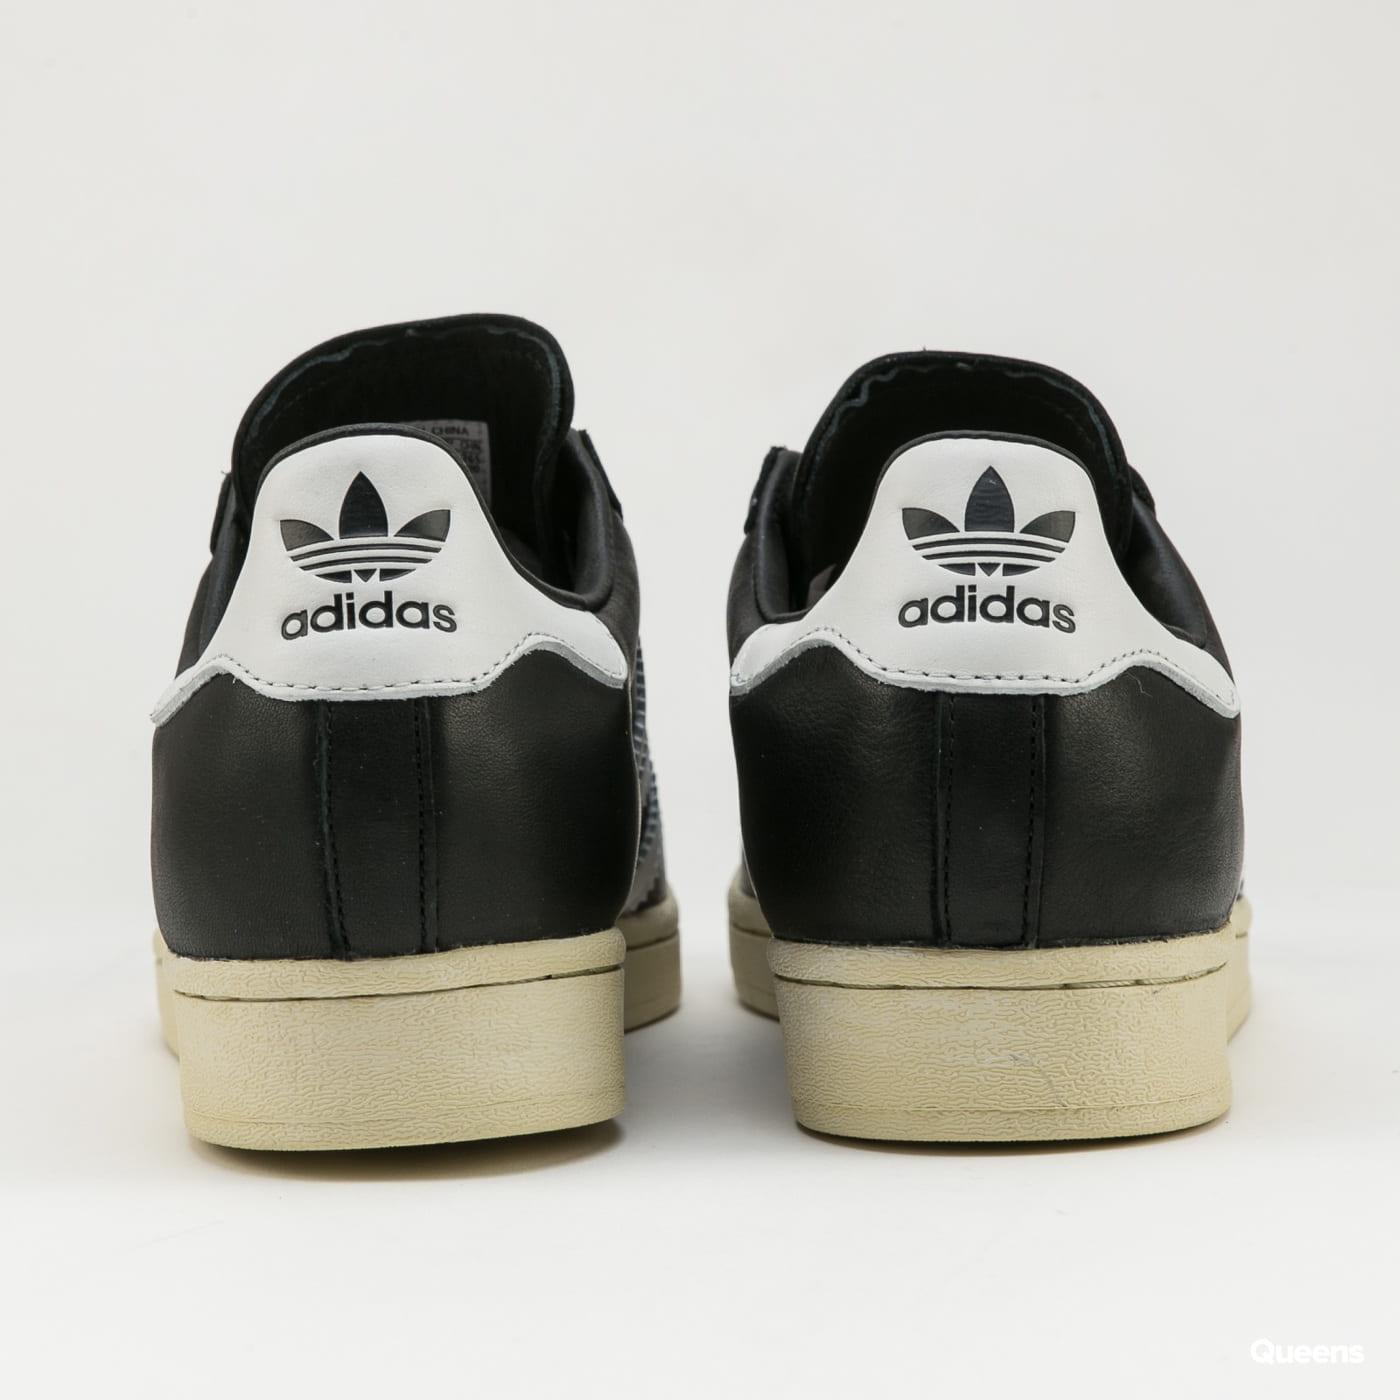 adidas Originals Superstar cblack / crywht / blue